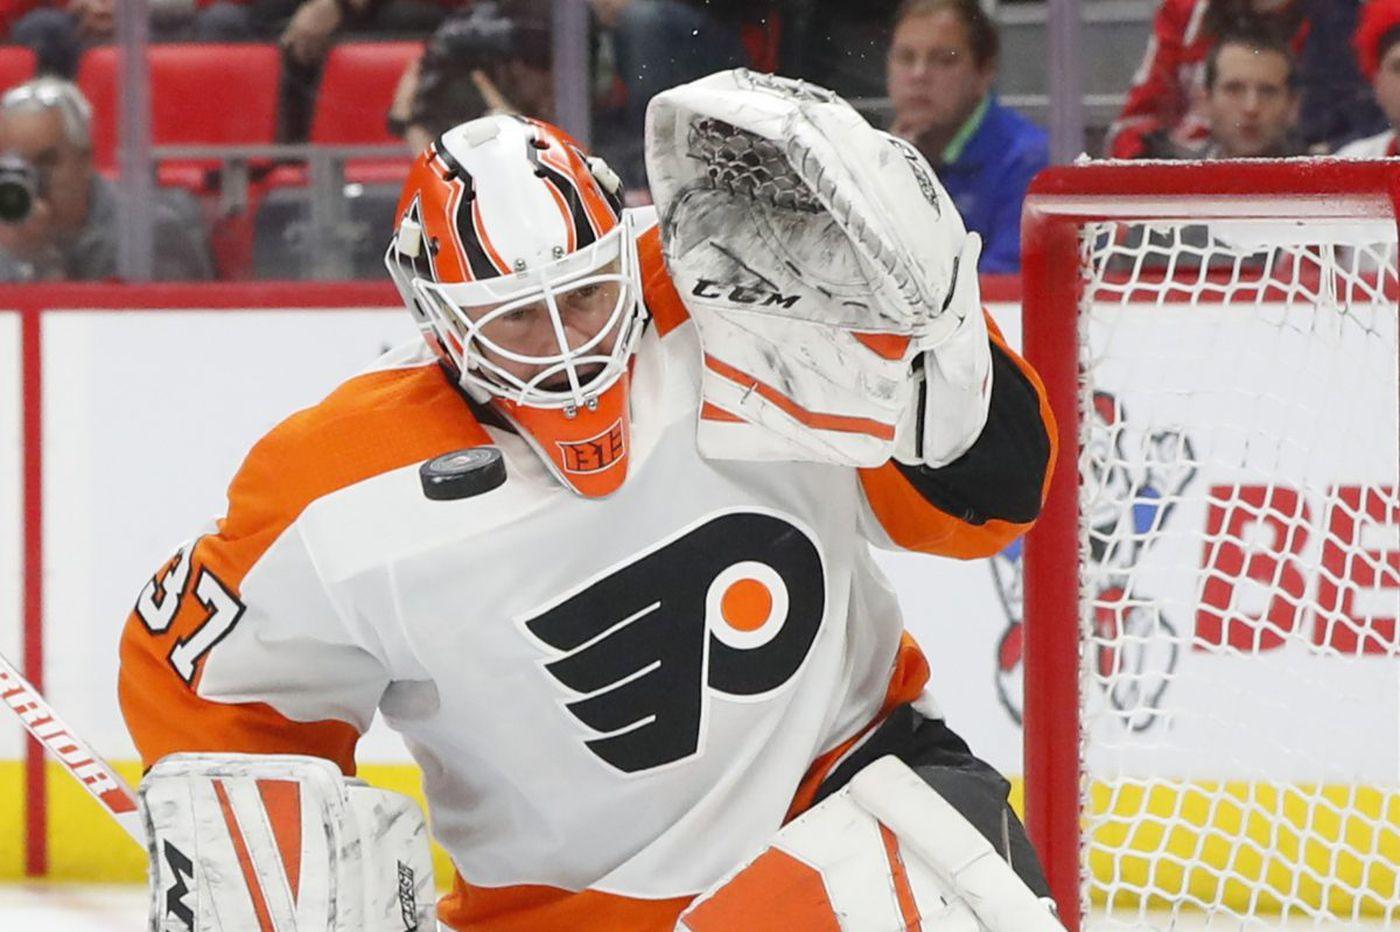 Flyers goalies Brian Elliott, Michal Neuvirth missing from Monday practice